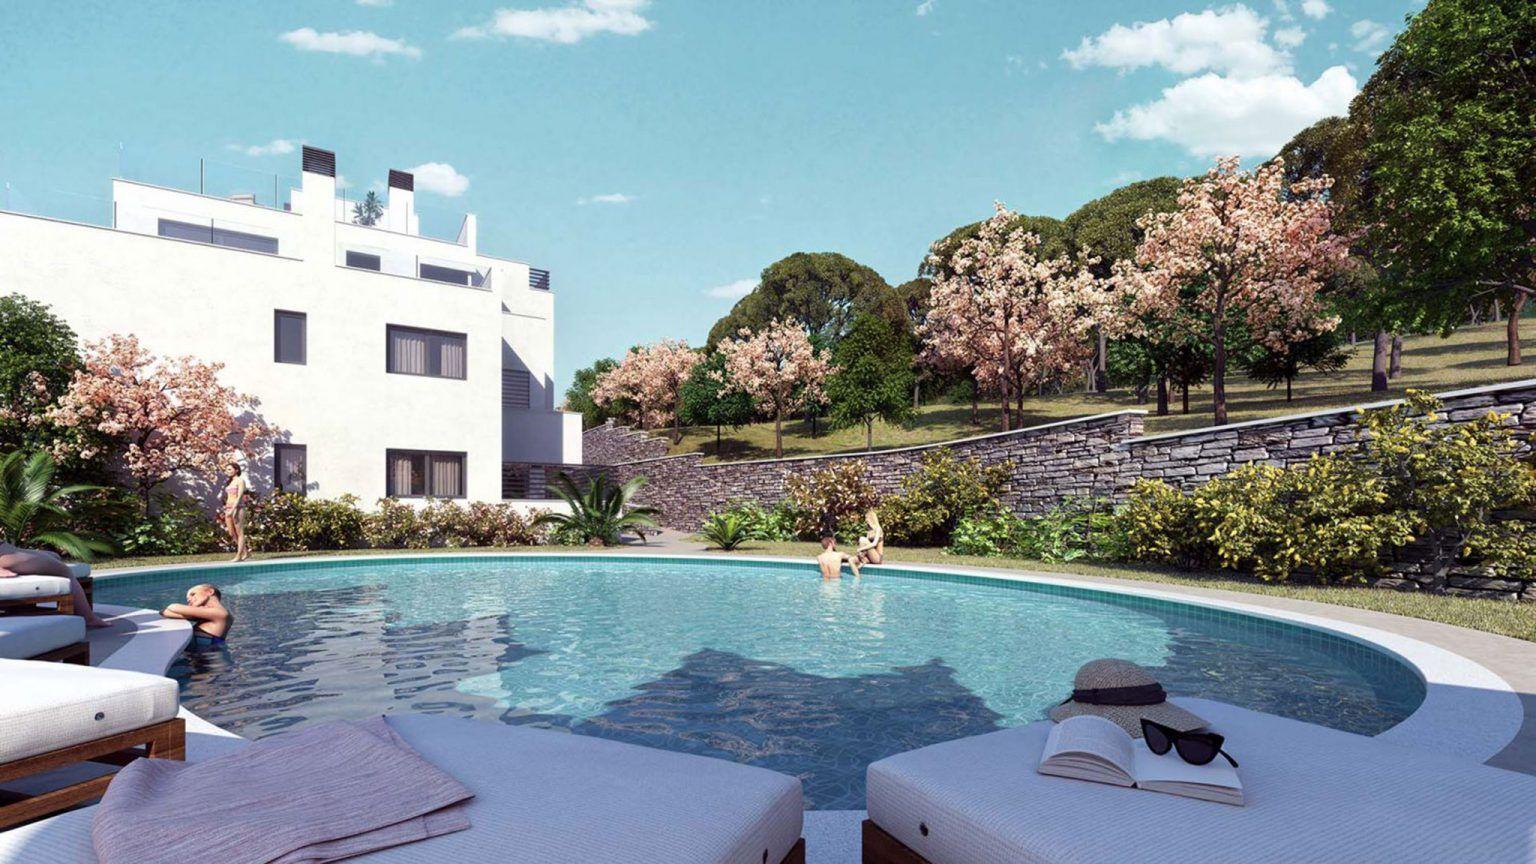 AVS01147-Apartments-canada-18